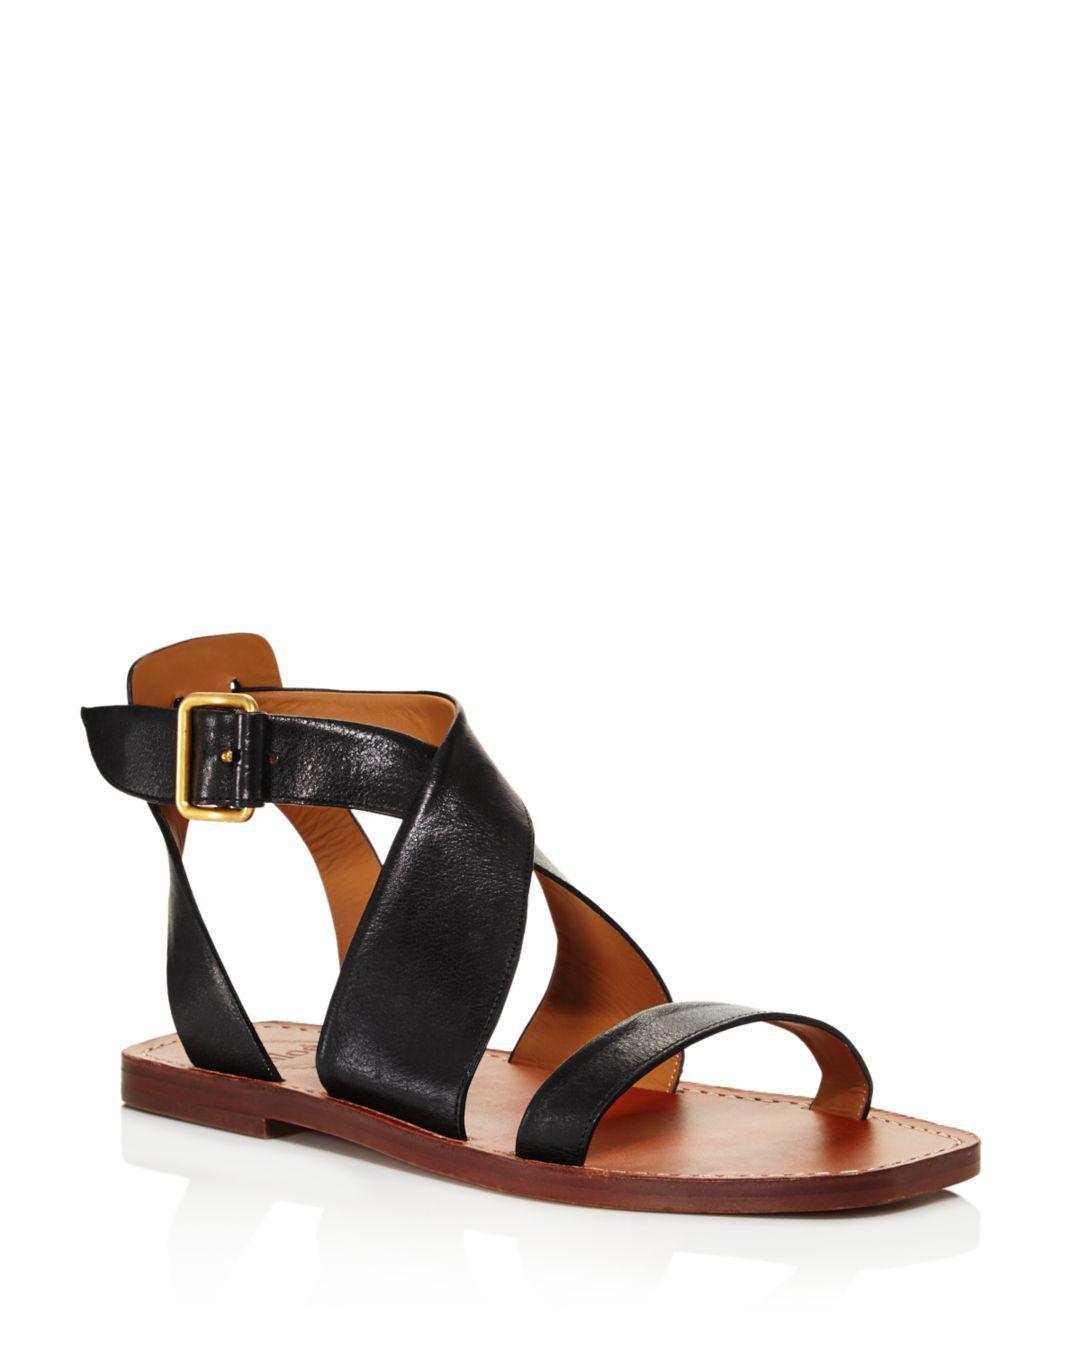 a4f3e9e07c2d2f Chloé Women s Virginia Leather Ankle Strap Sandals in Black - Lyst